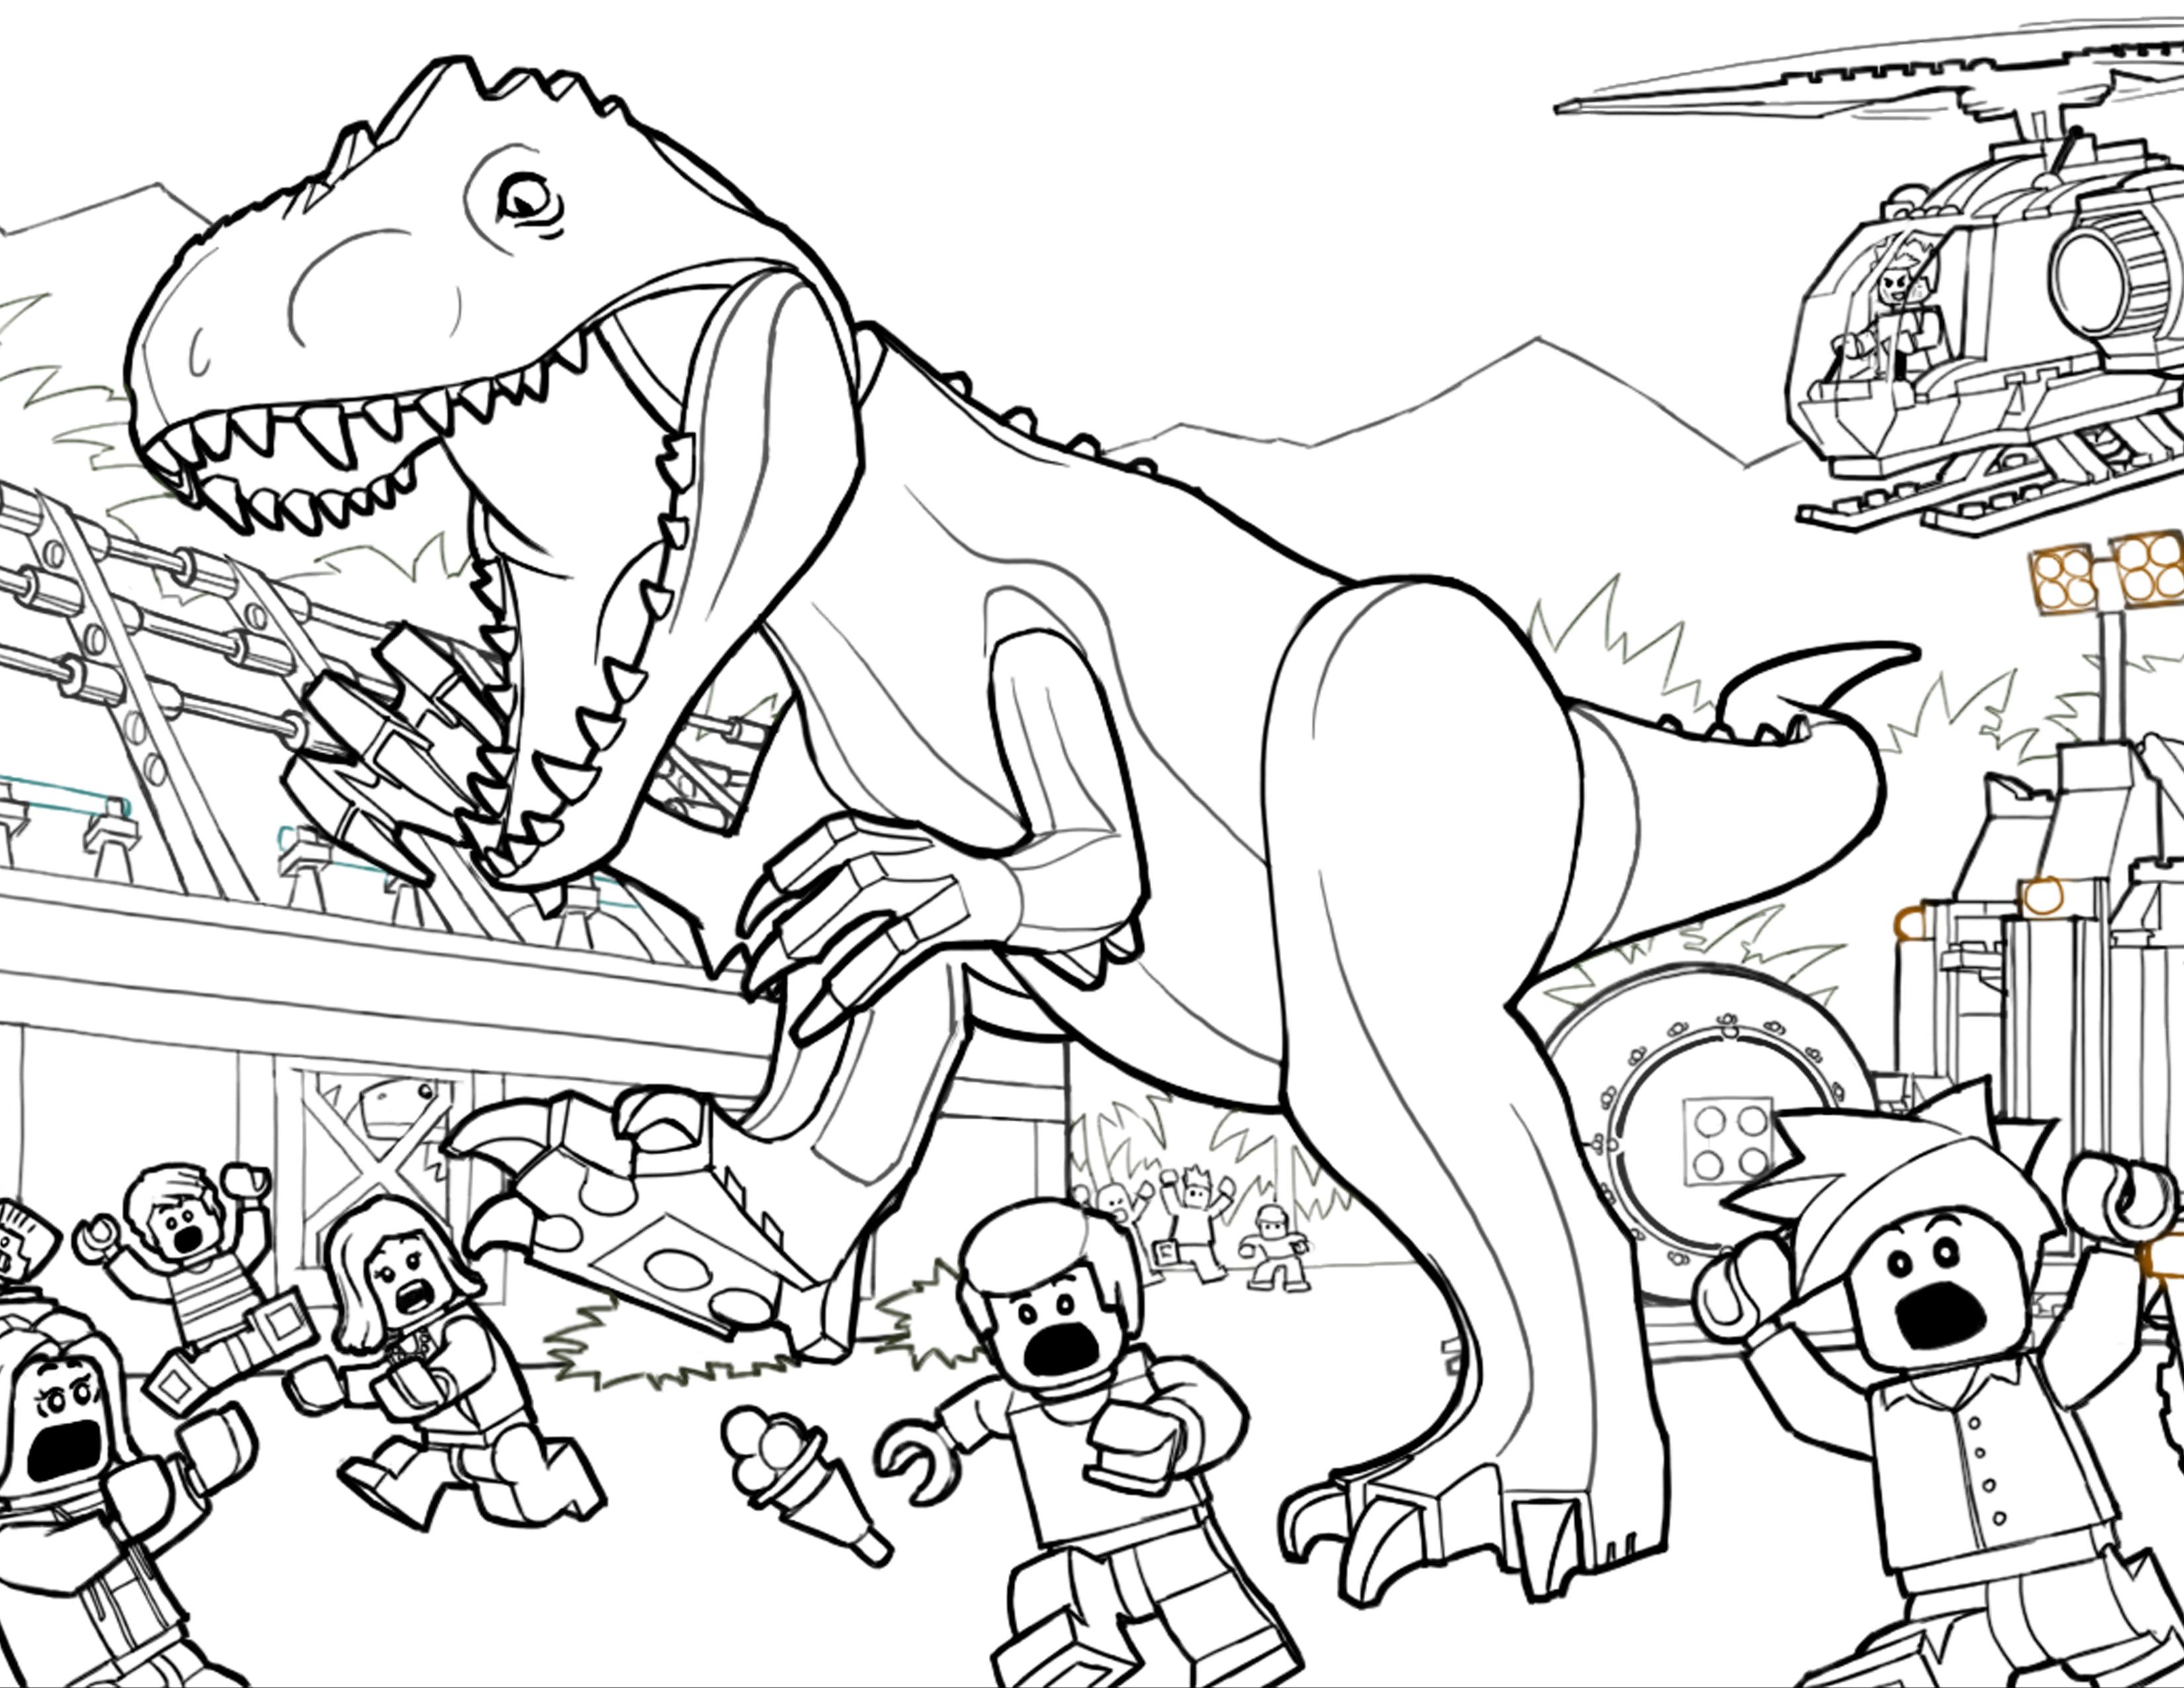 Ausmalbilder Lego Jurassic World   Dinosaur coloring pages ...